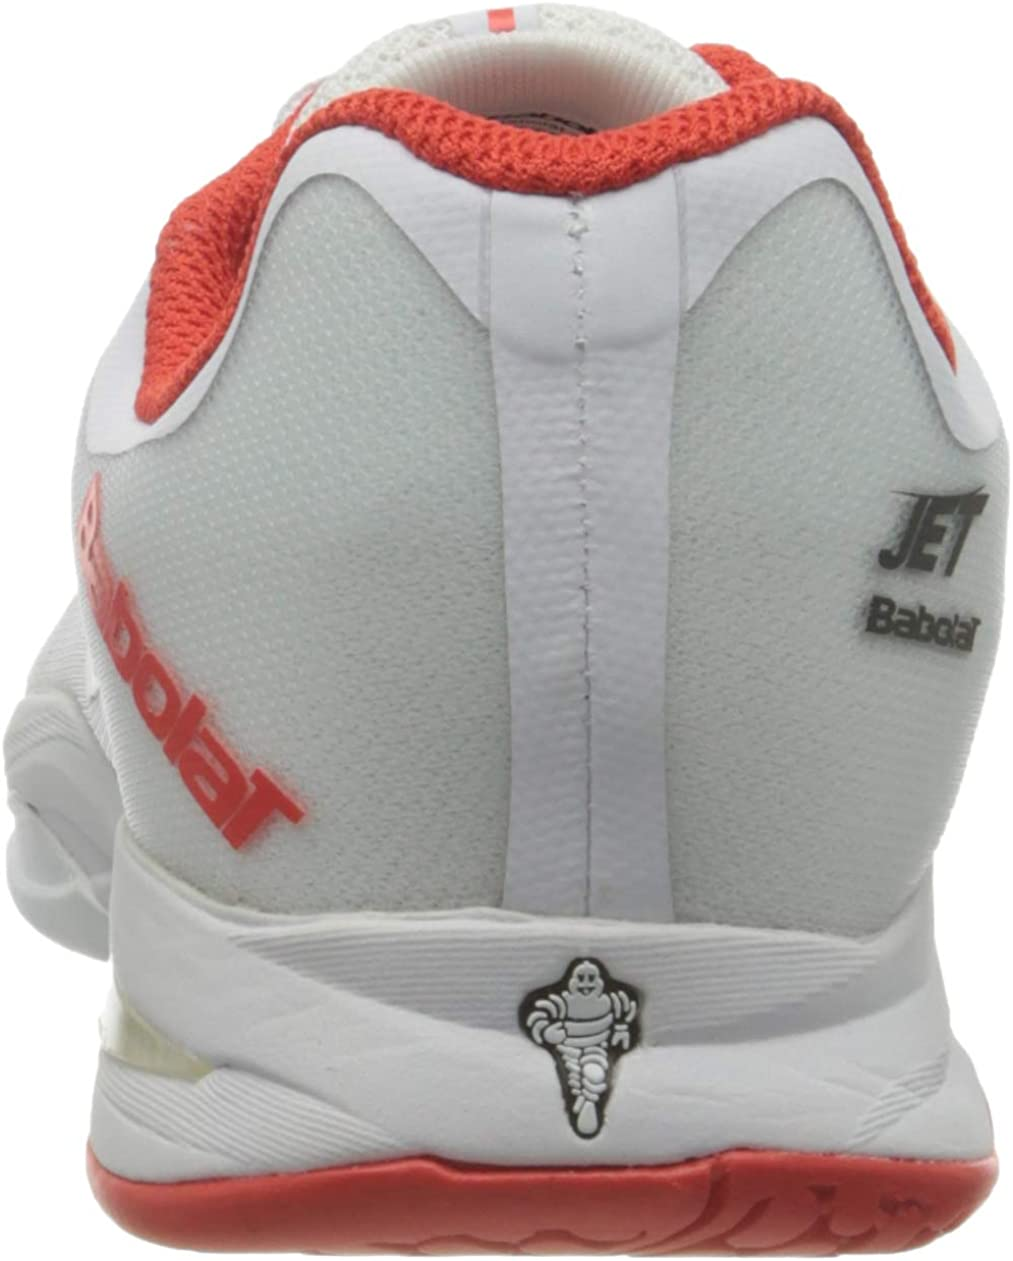 Babolat Juniors` Jet All Court Tennis Shoes White 2